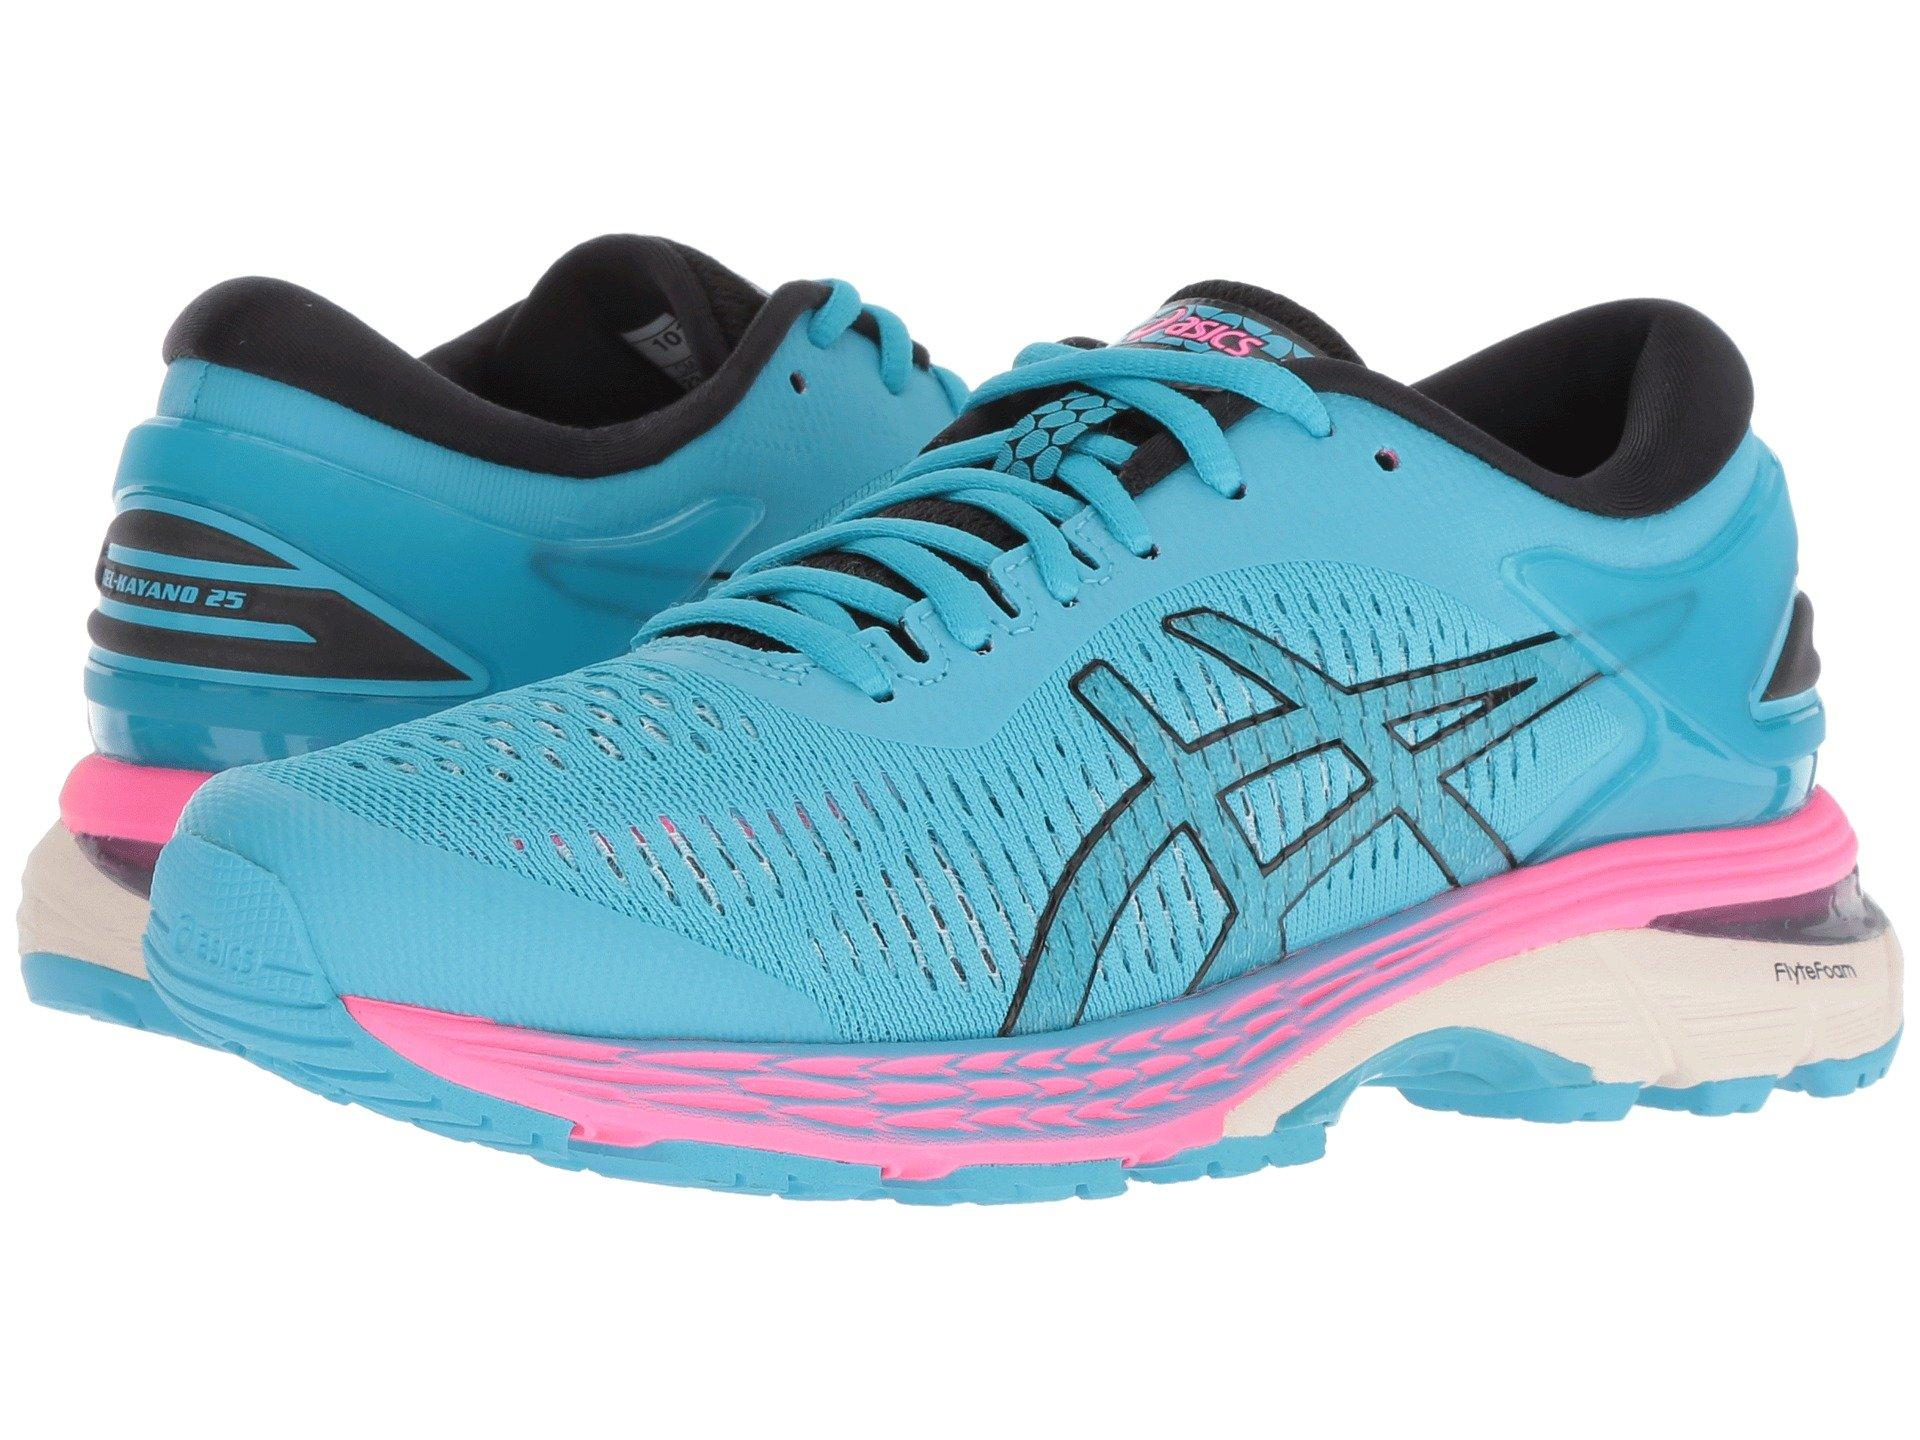 ad9e5826ebaa Asics Gel-kayano(r) 25 (mid Grey/blue Coast) Women's Running Shoes ...